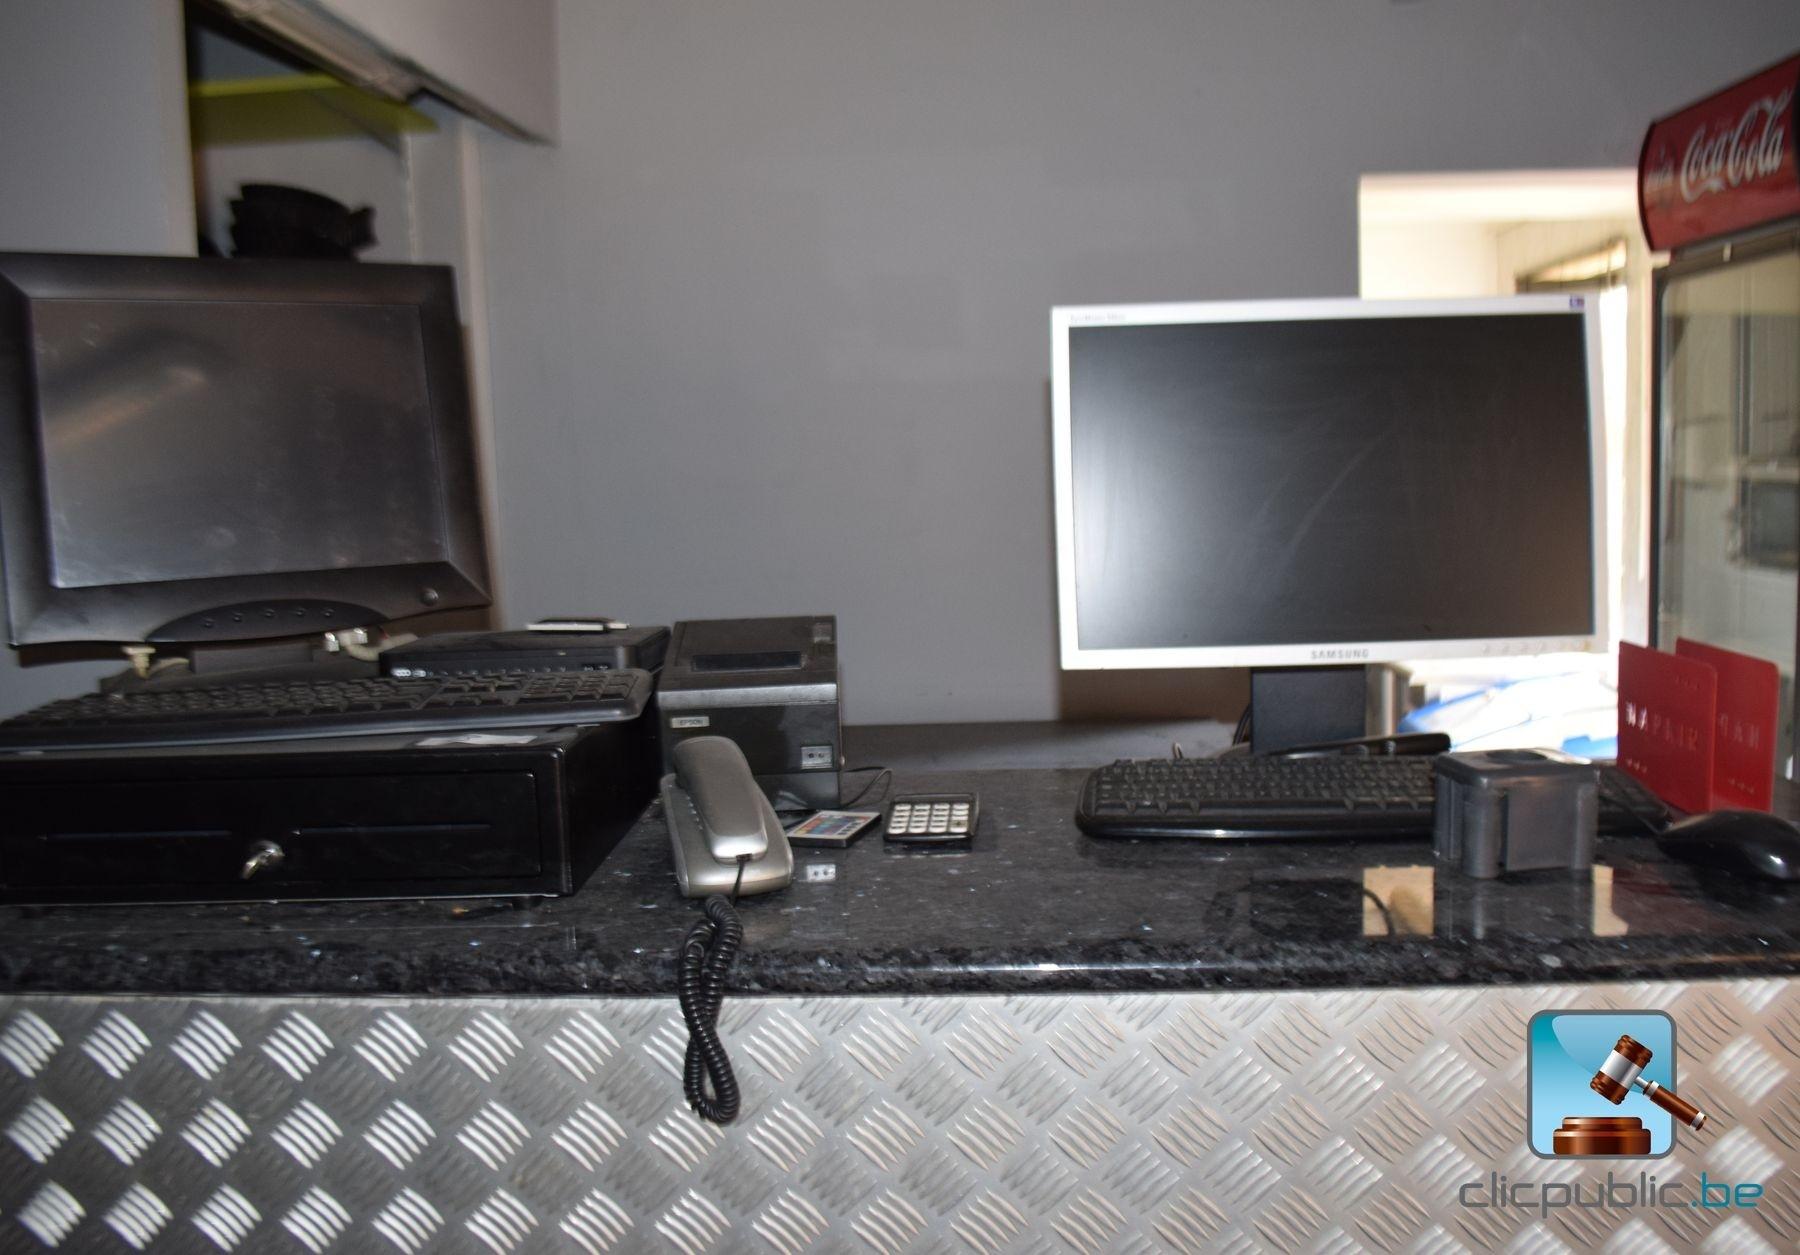 ordinateur de bureau samsung samsung galaxy s8 and galaxy. Black Bedroom Furniture Sets. Home Design Ideas